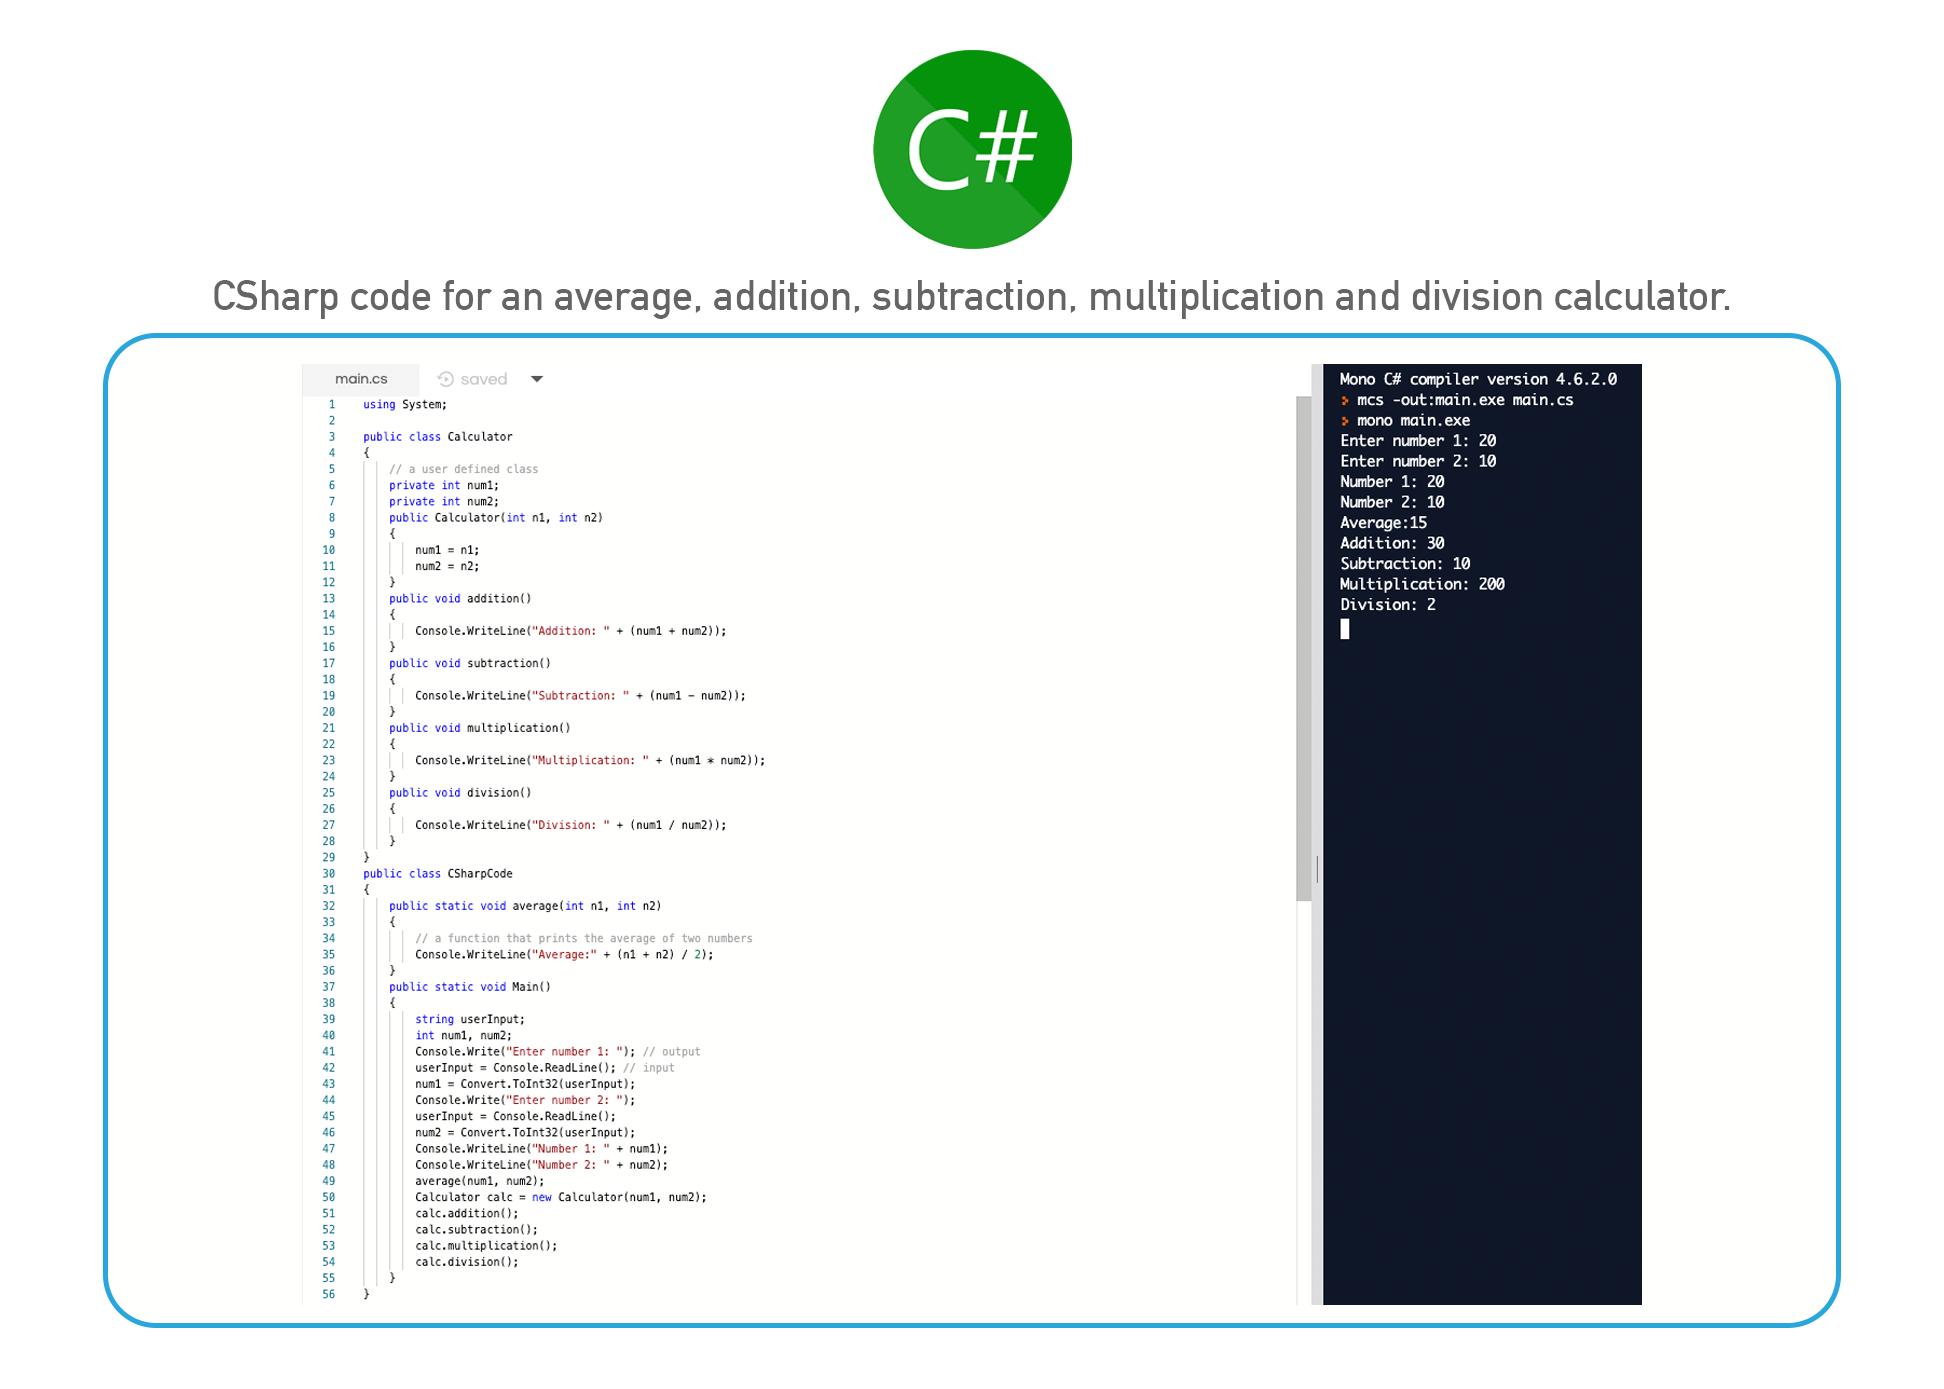 C# coding language